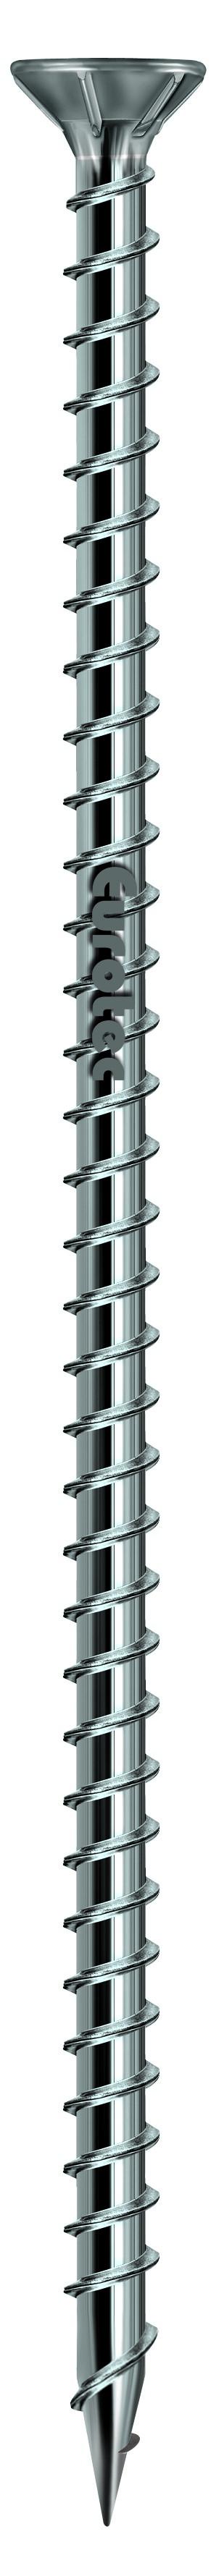 konstrux senkkopf 11 3 mm vollgewindeschraube ag spitze stahl verzinkt tx50 online. Black Bedroom Furniture Sets. Home Design Ideas